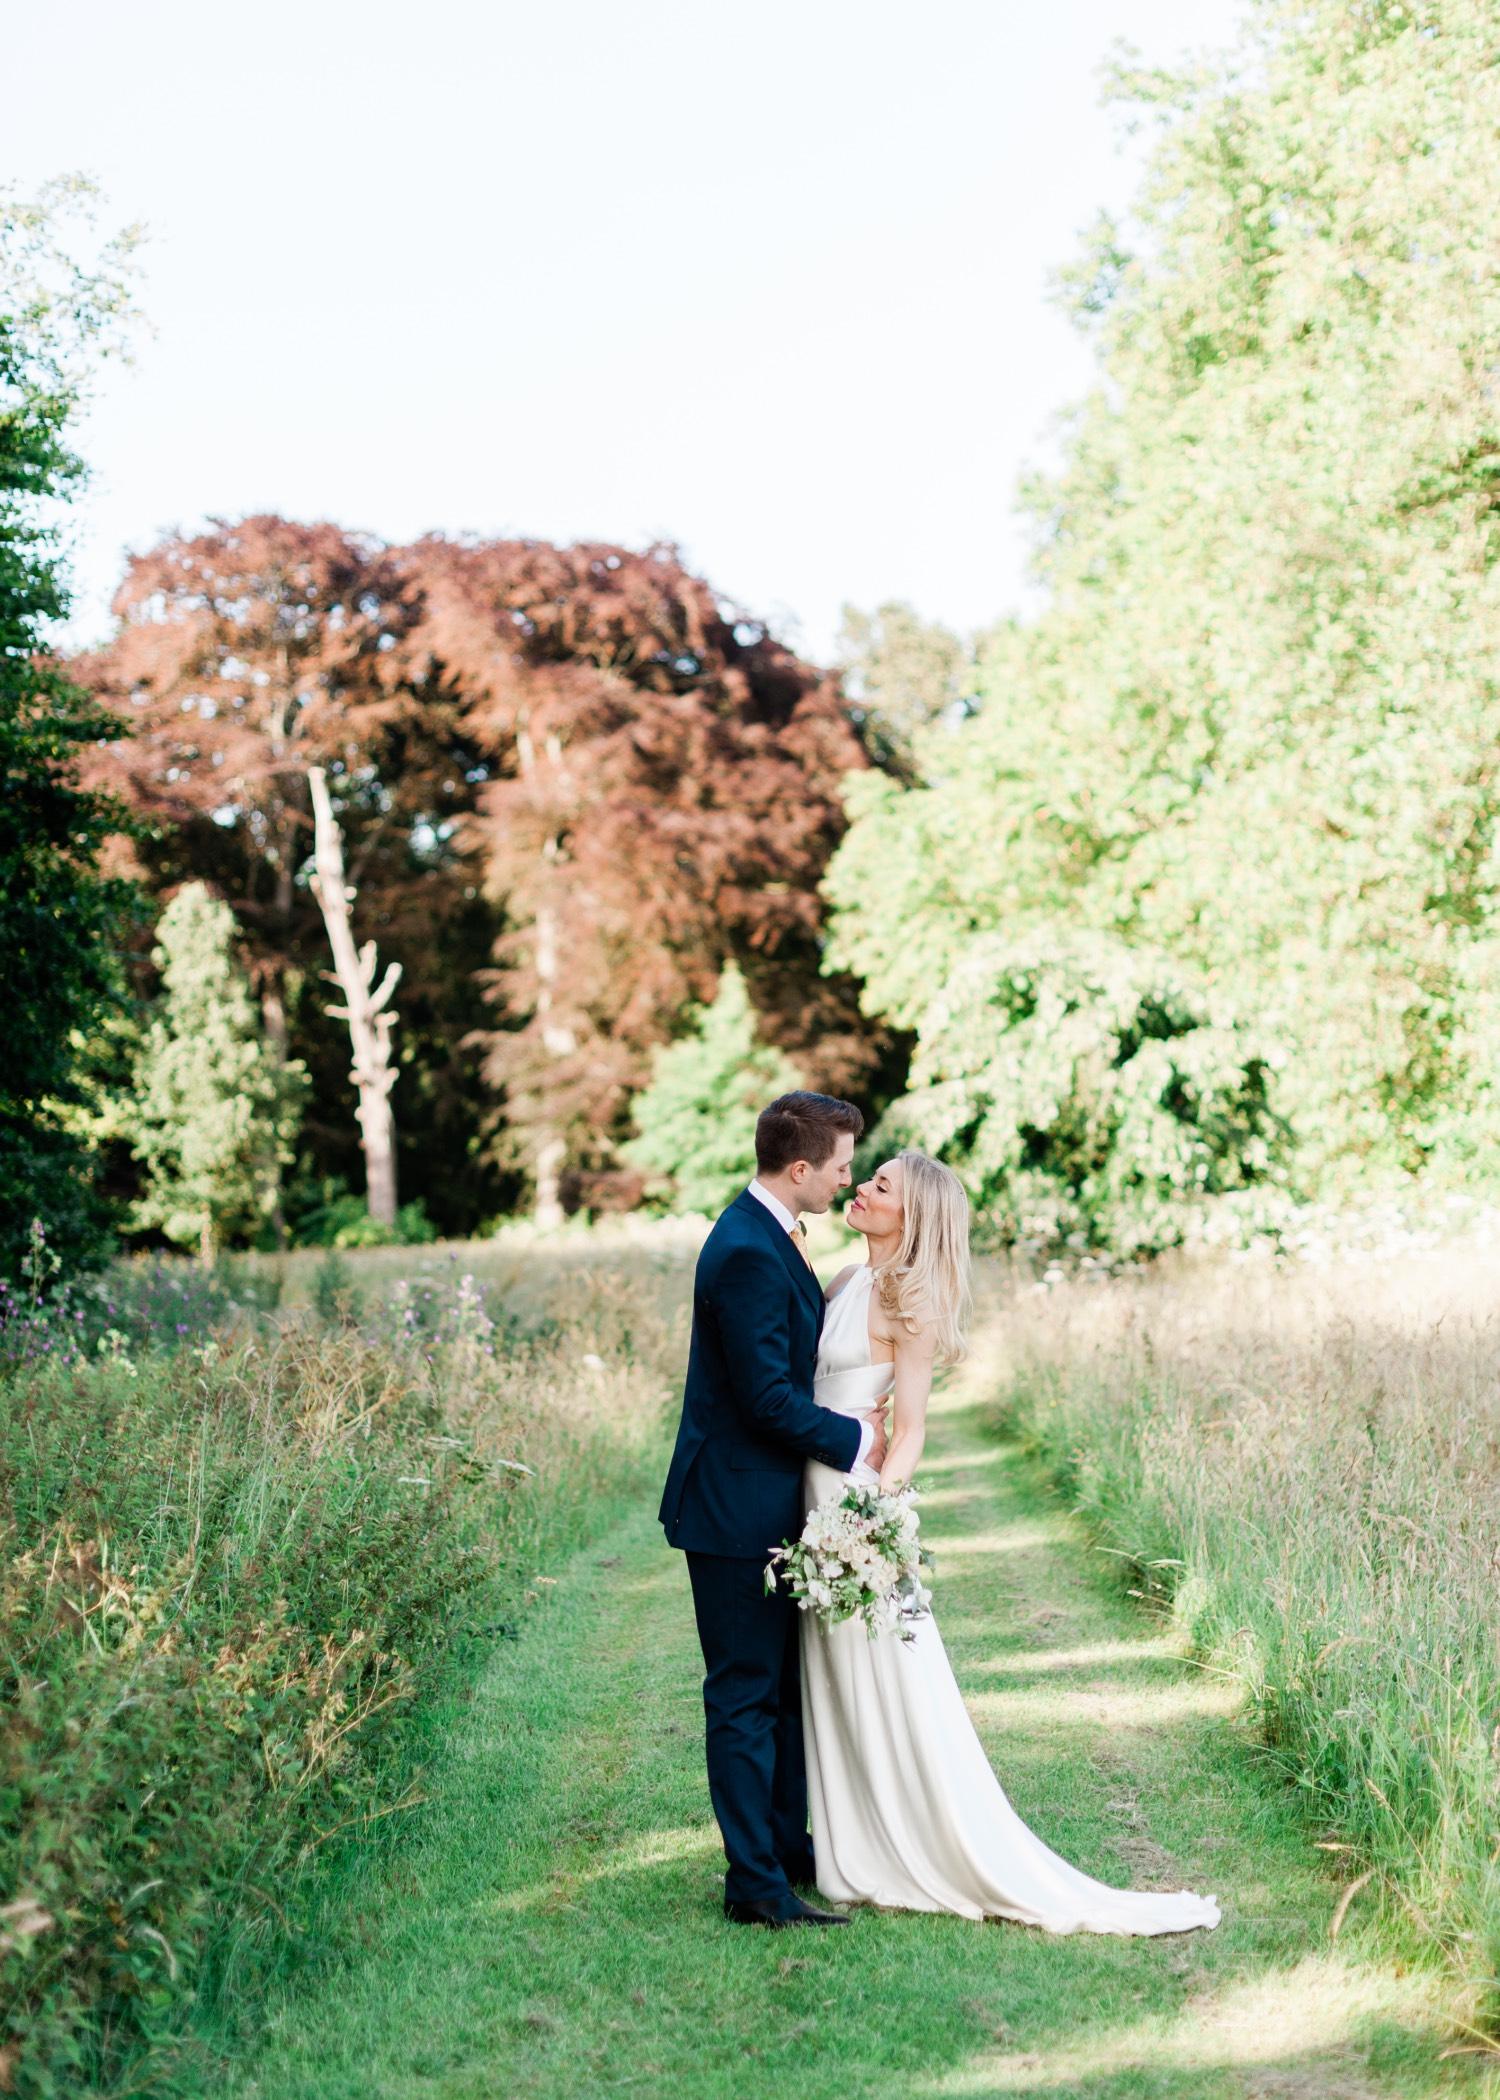 Littleton-Rose-Syon-House-London-Wedding-Planner-Bride-and-Groom-2 (1).jpg